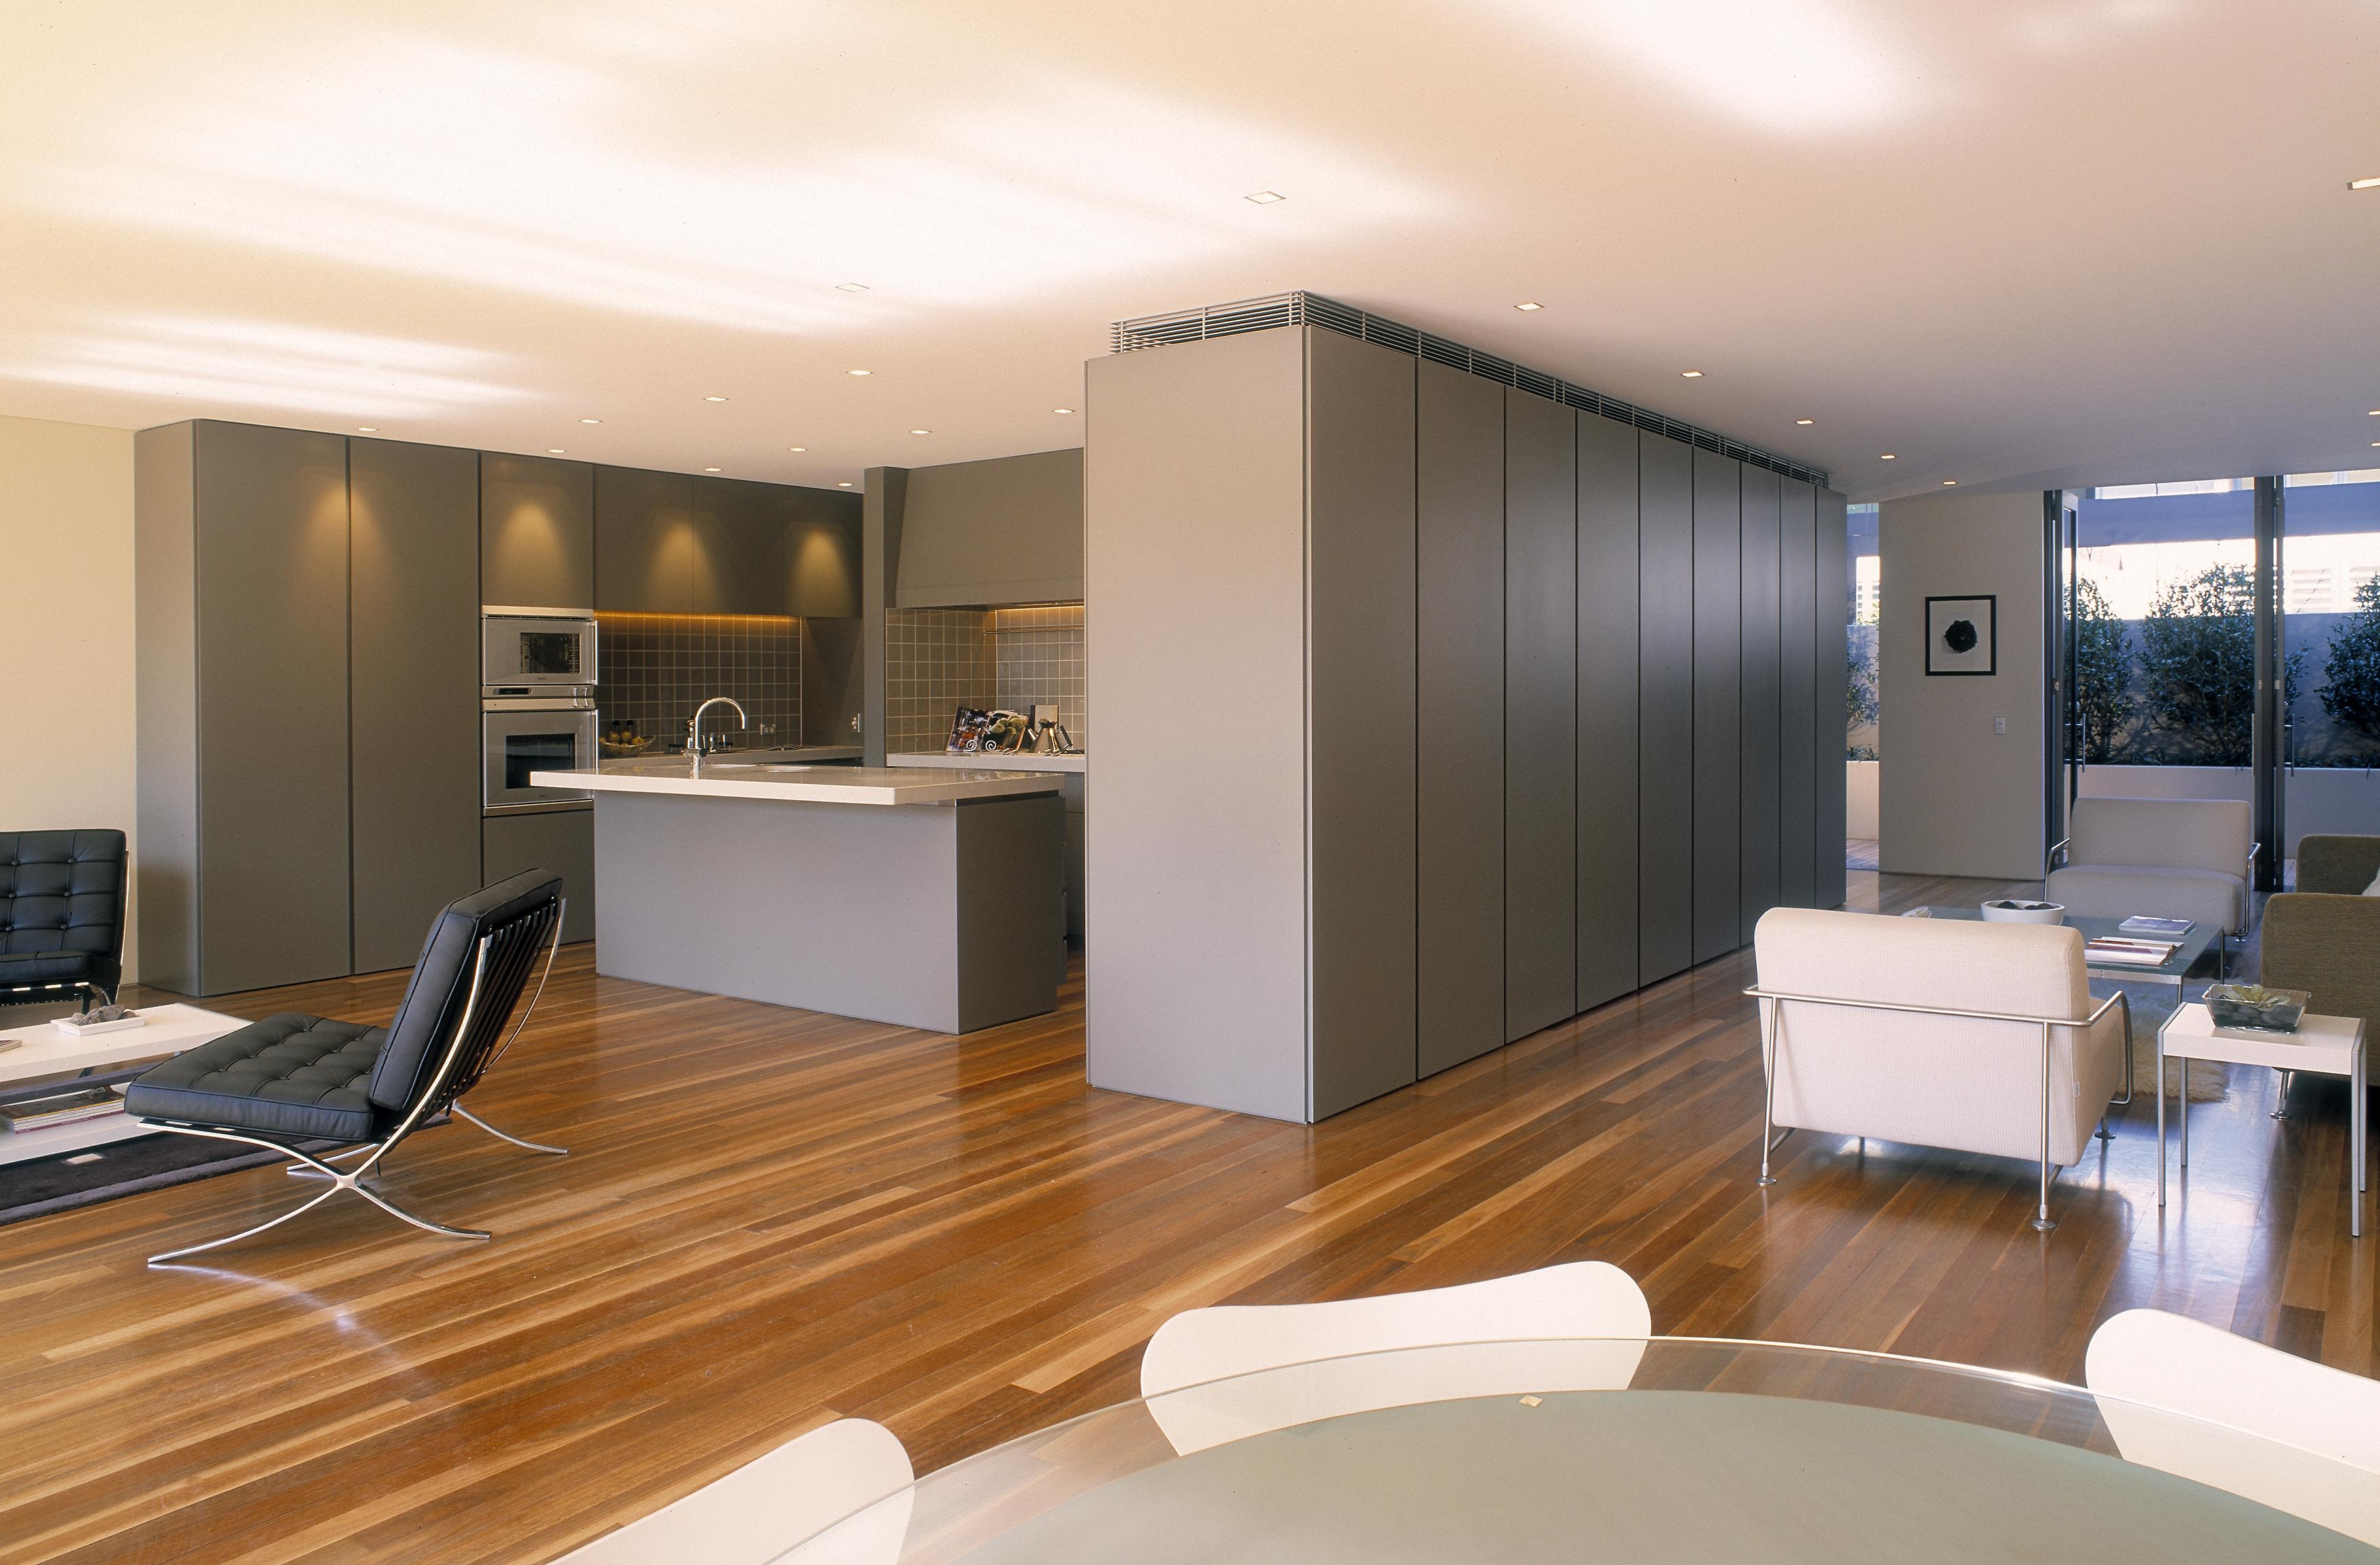 Come arredare una casa moderna idealista news for Arredare una casa moderna